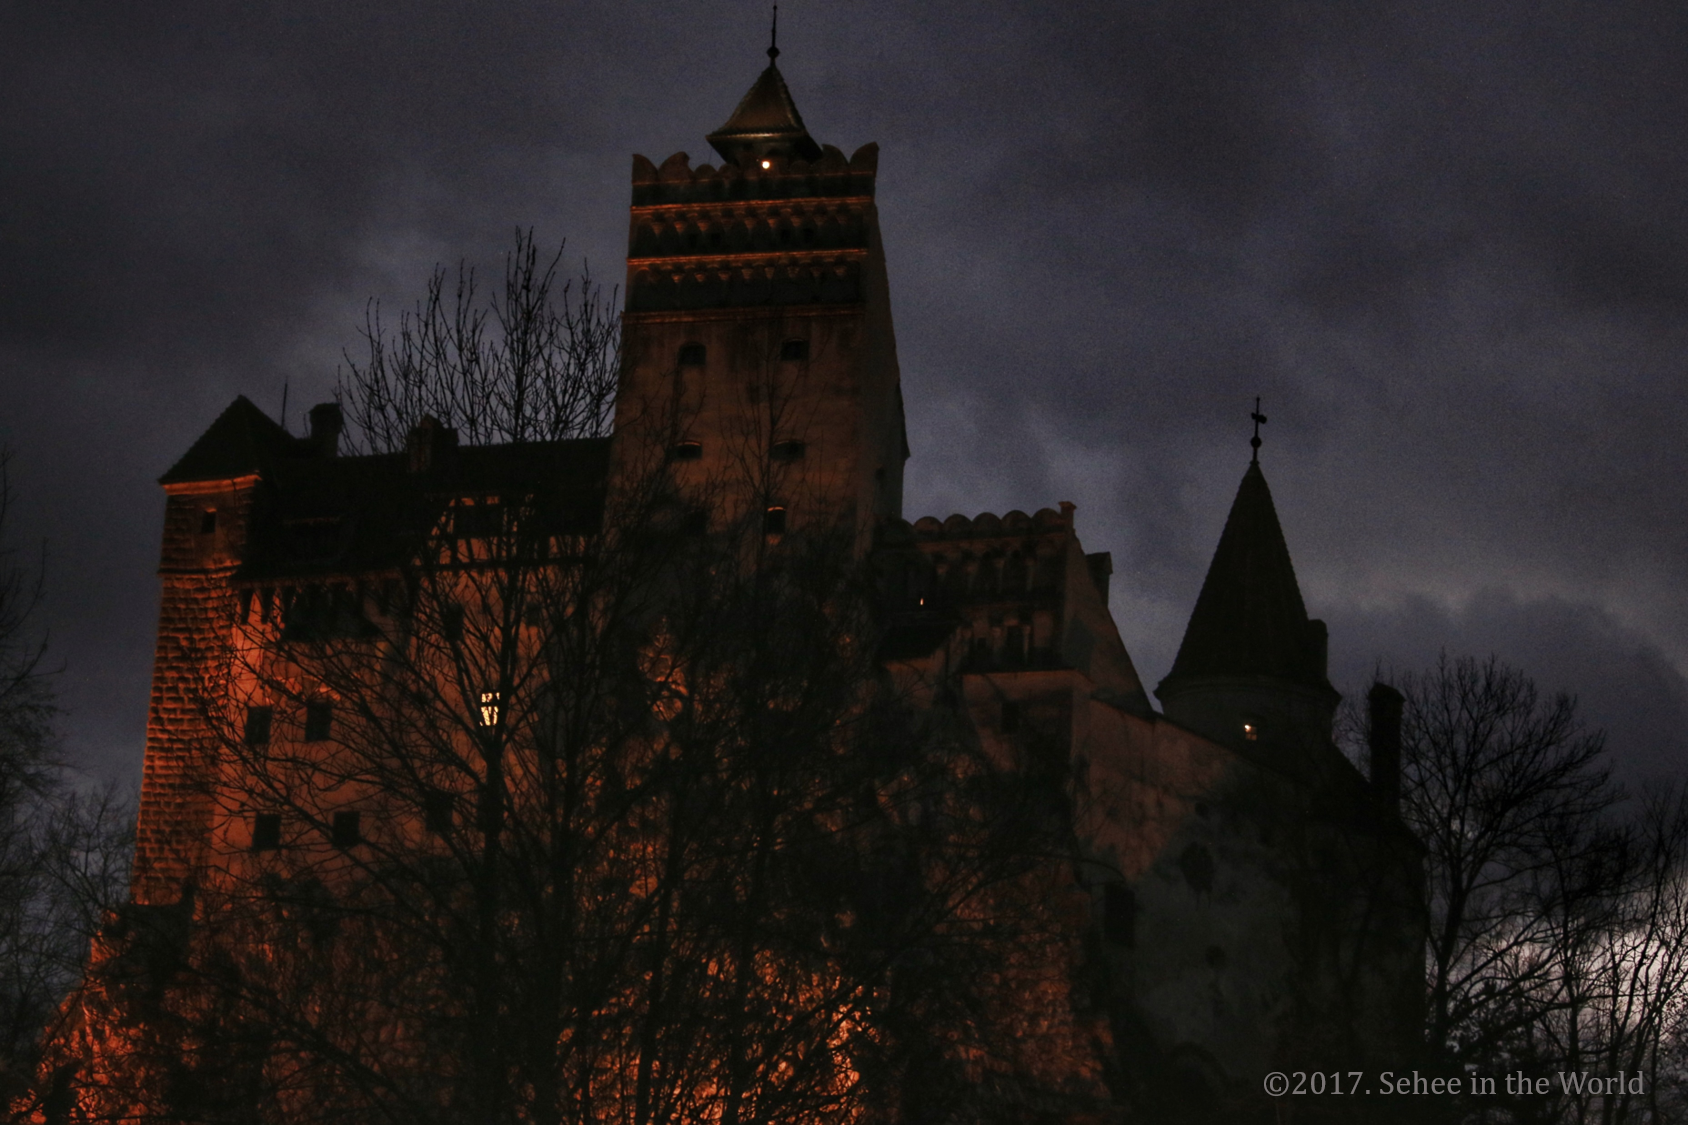 Bran Castle, Romania, Halloween, Dracula Castle, Halloween night, Sehee in the World